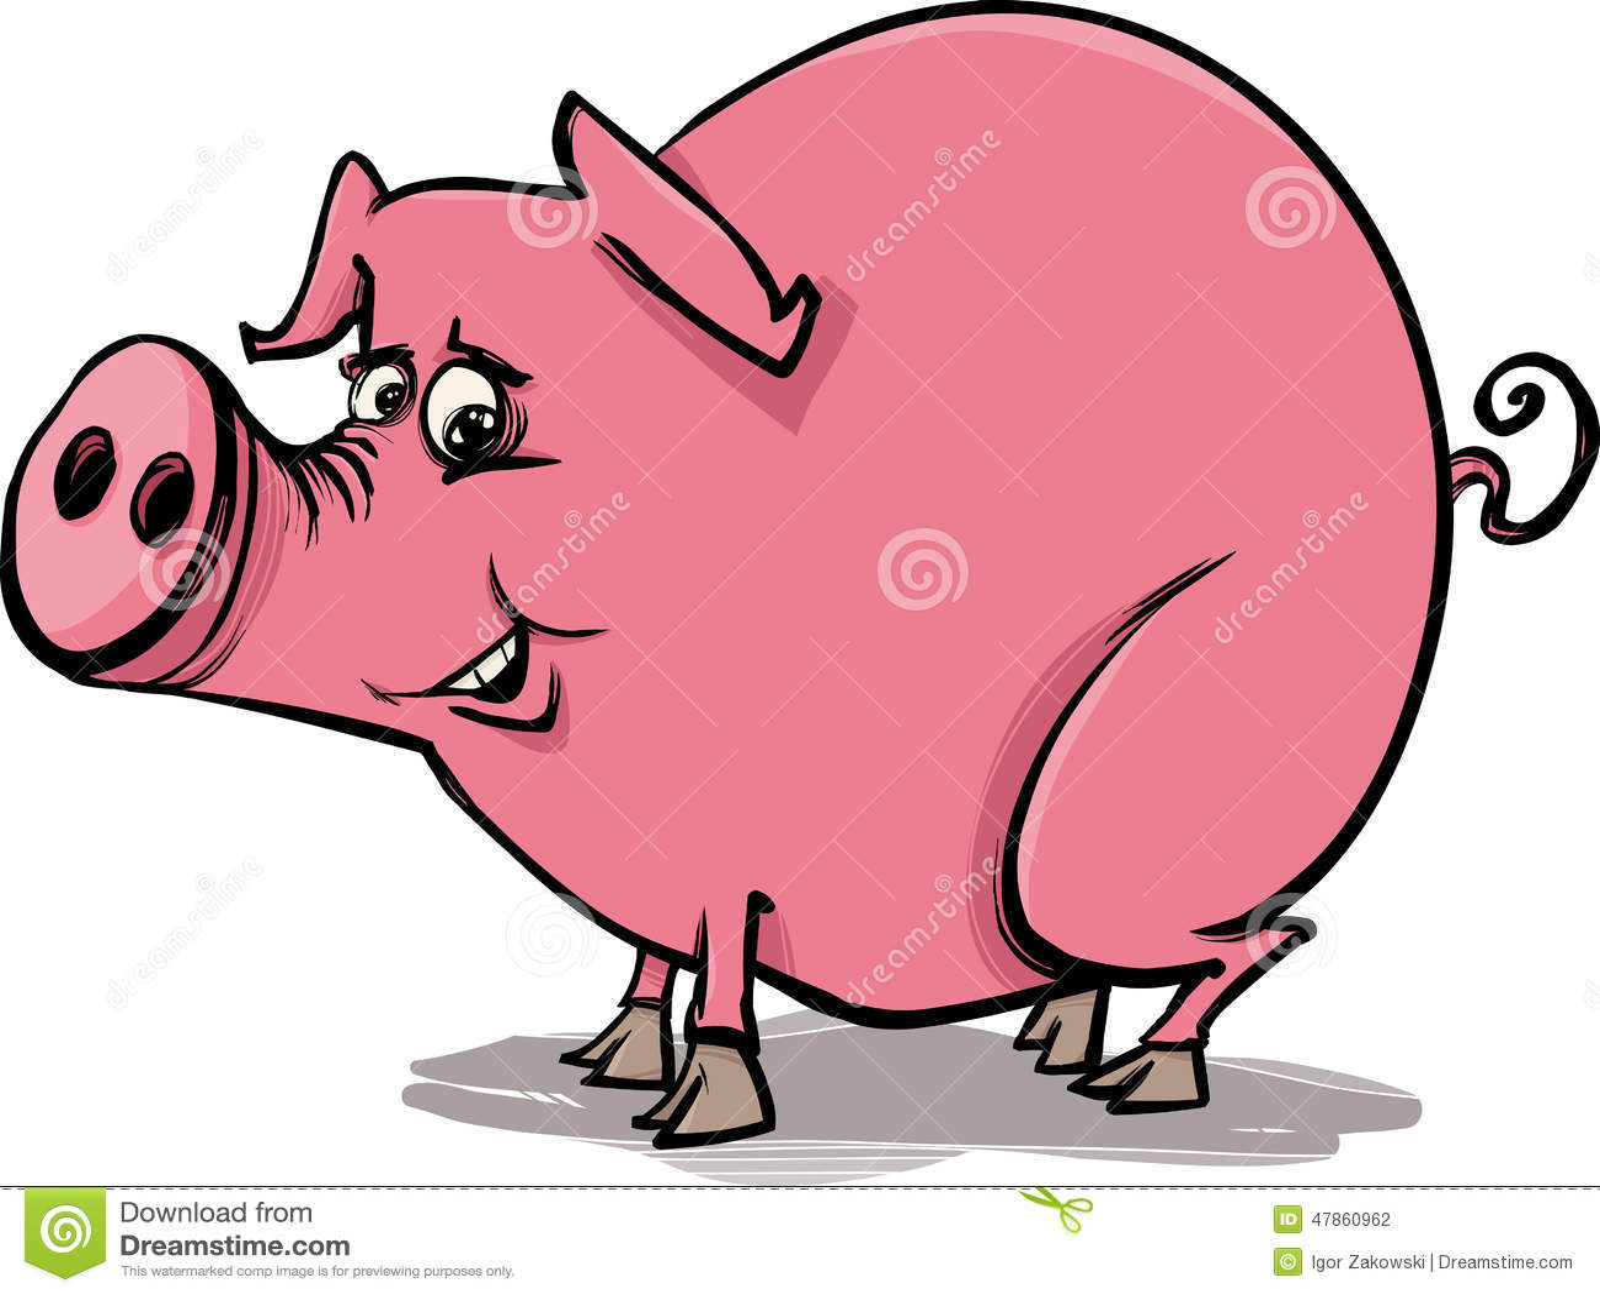 clip art funny pigs - photo #29